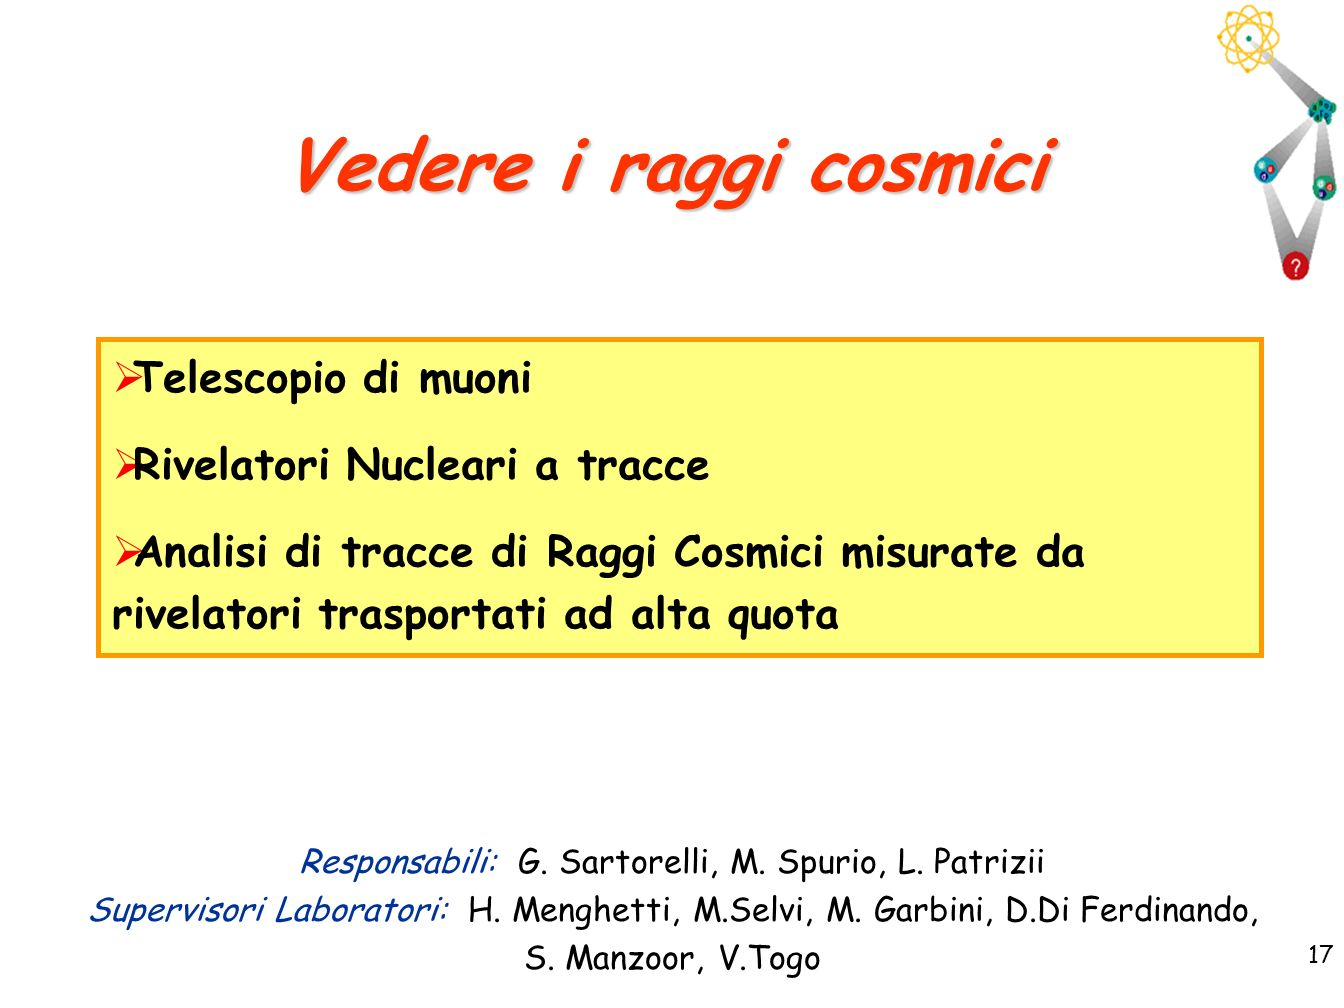 Responsabili: G. Sartorelli, M. Spurio, L. Patrizii